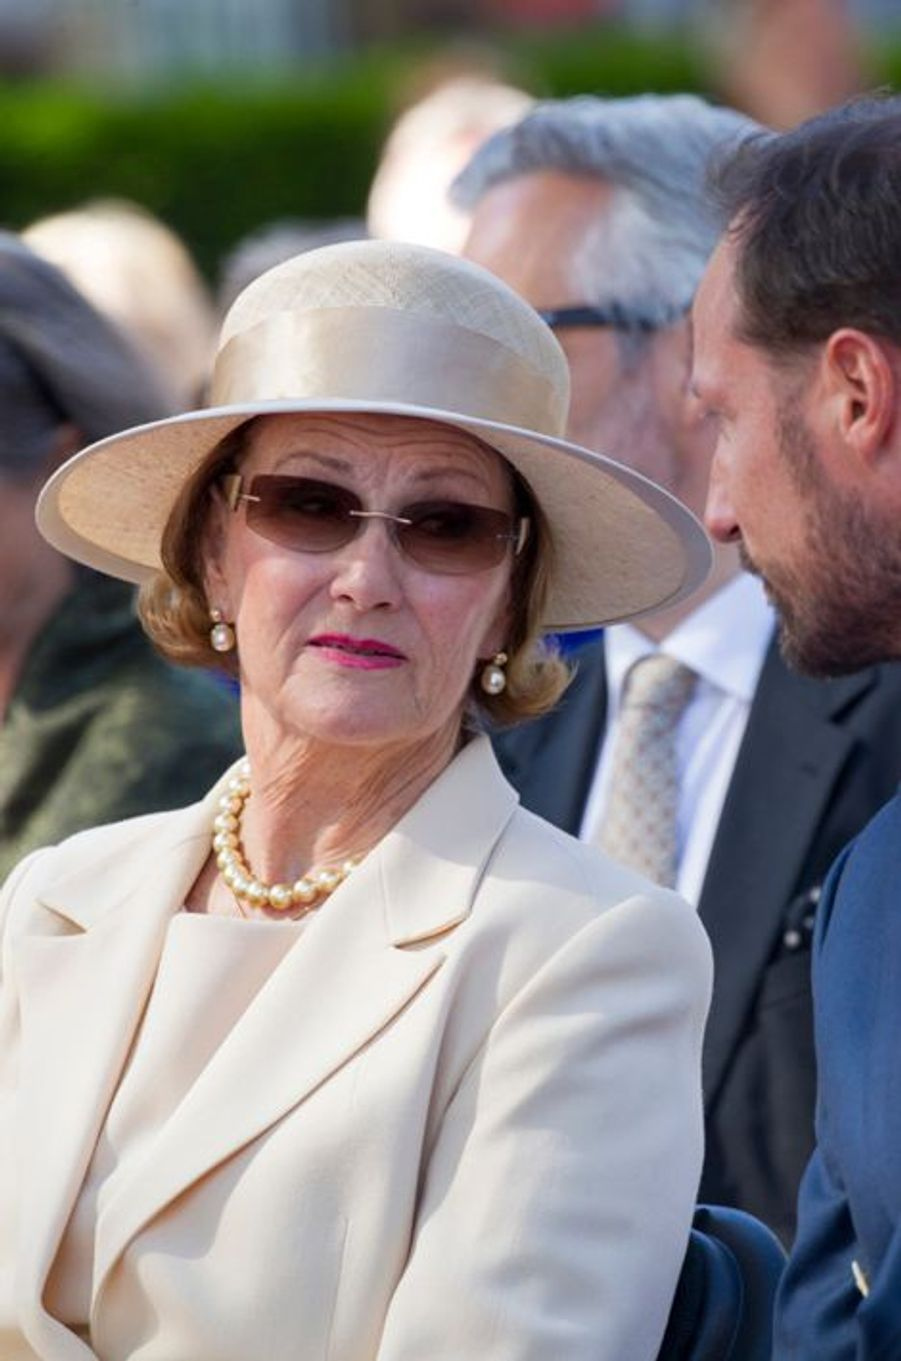 La reine Sonja et le prince Haakon de Norvège à Oslo, le 7 juin 2015